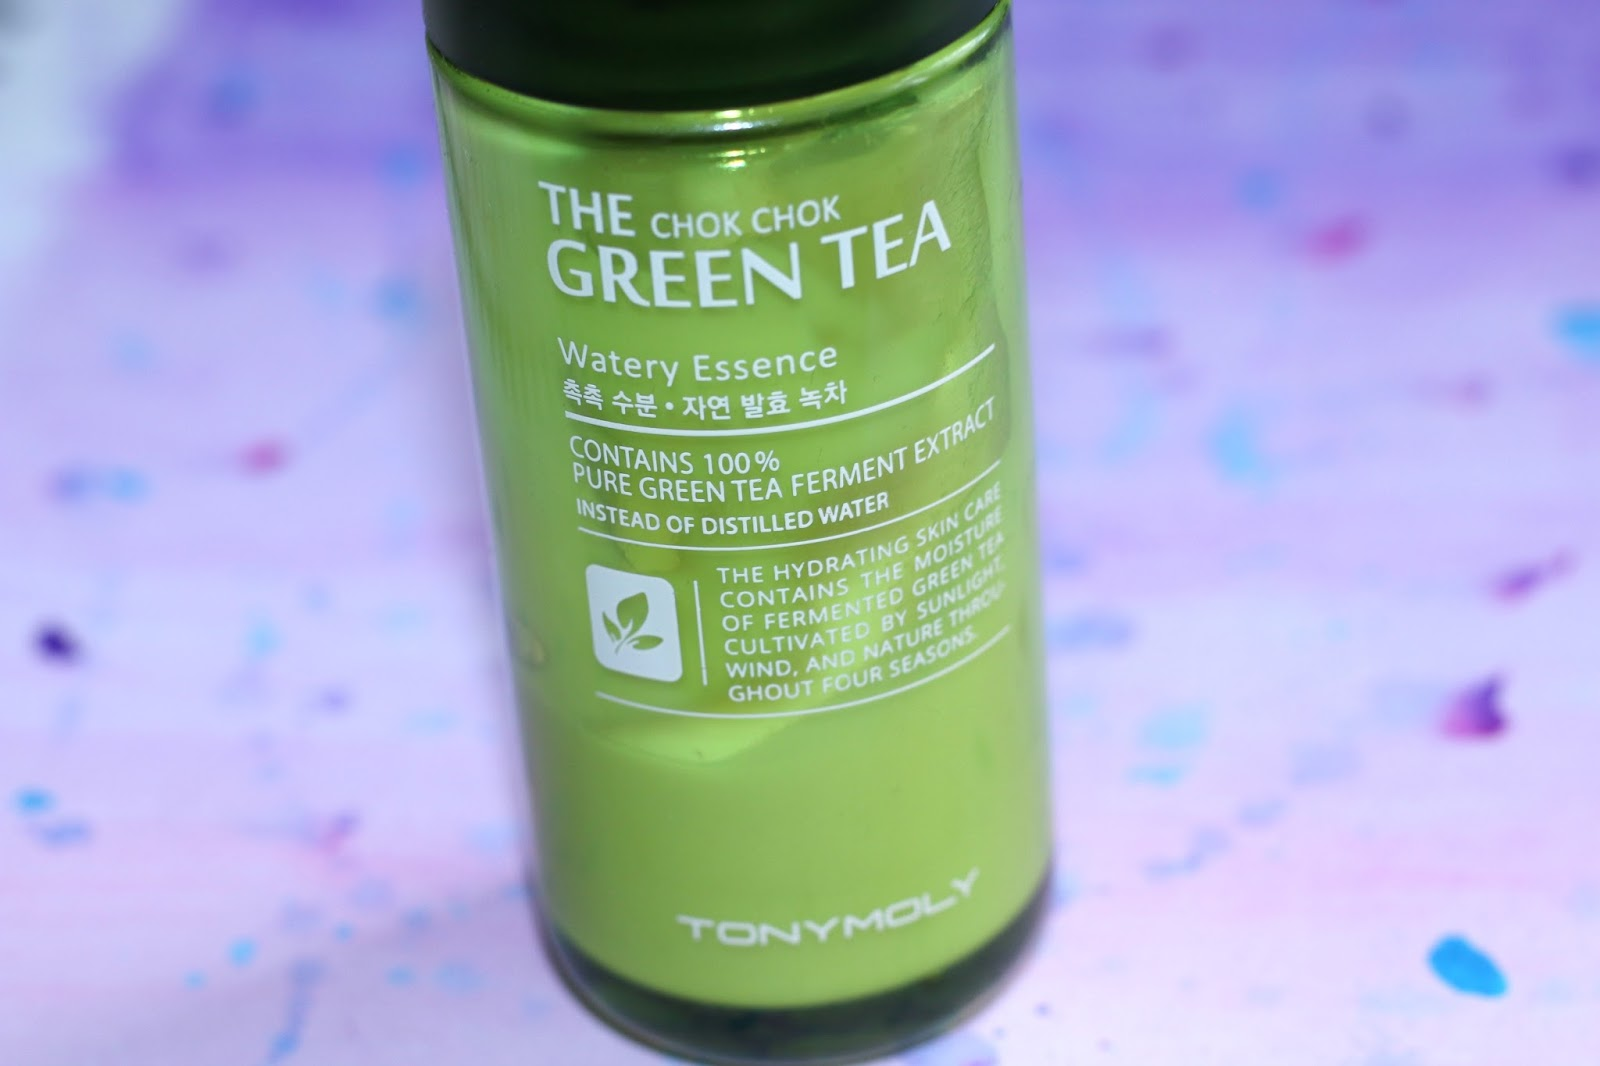 The Chok Chok Green Tea Watery Essence by TONYMOLY #20